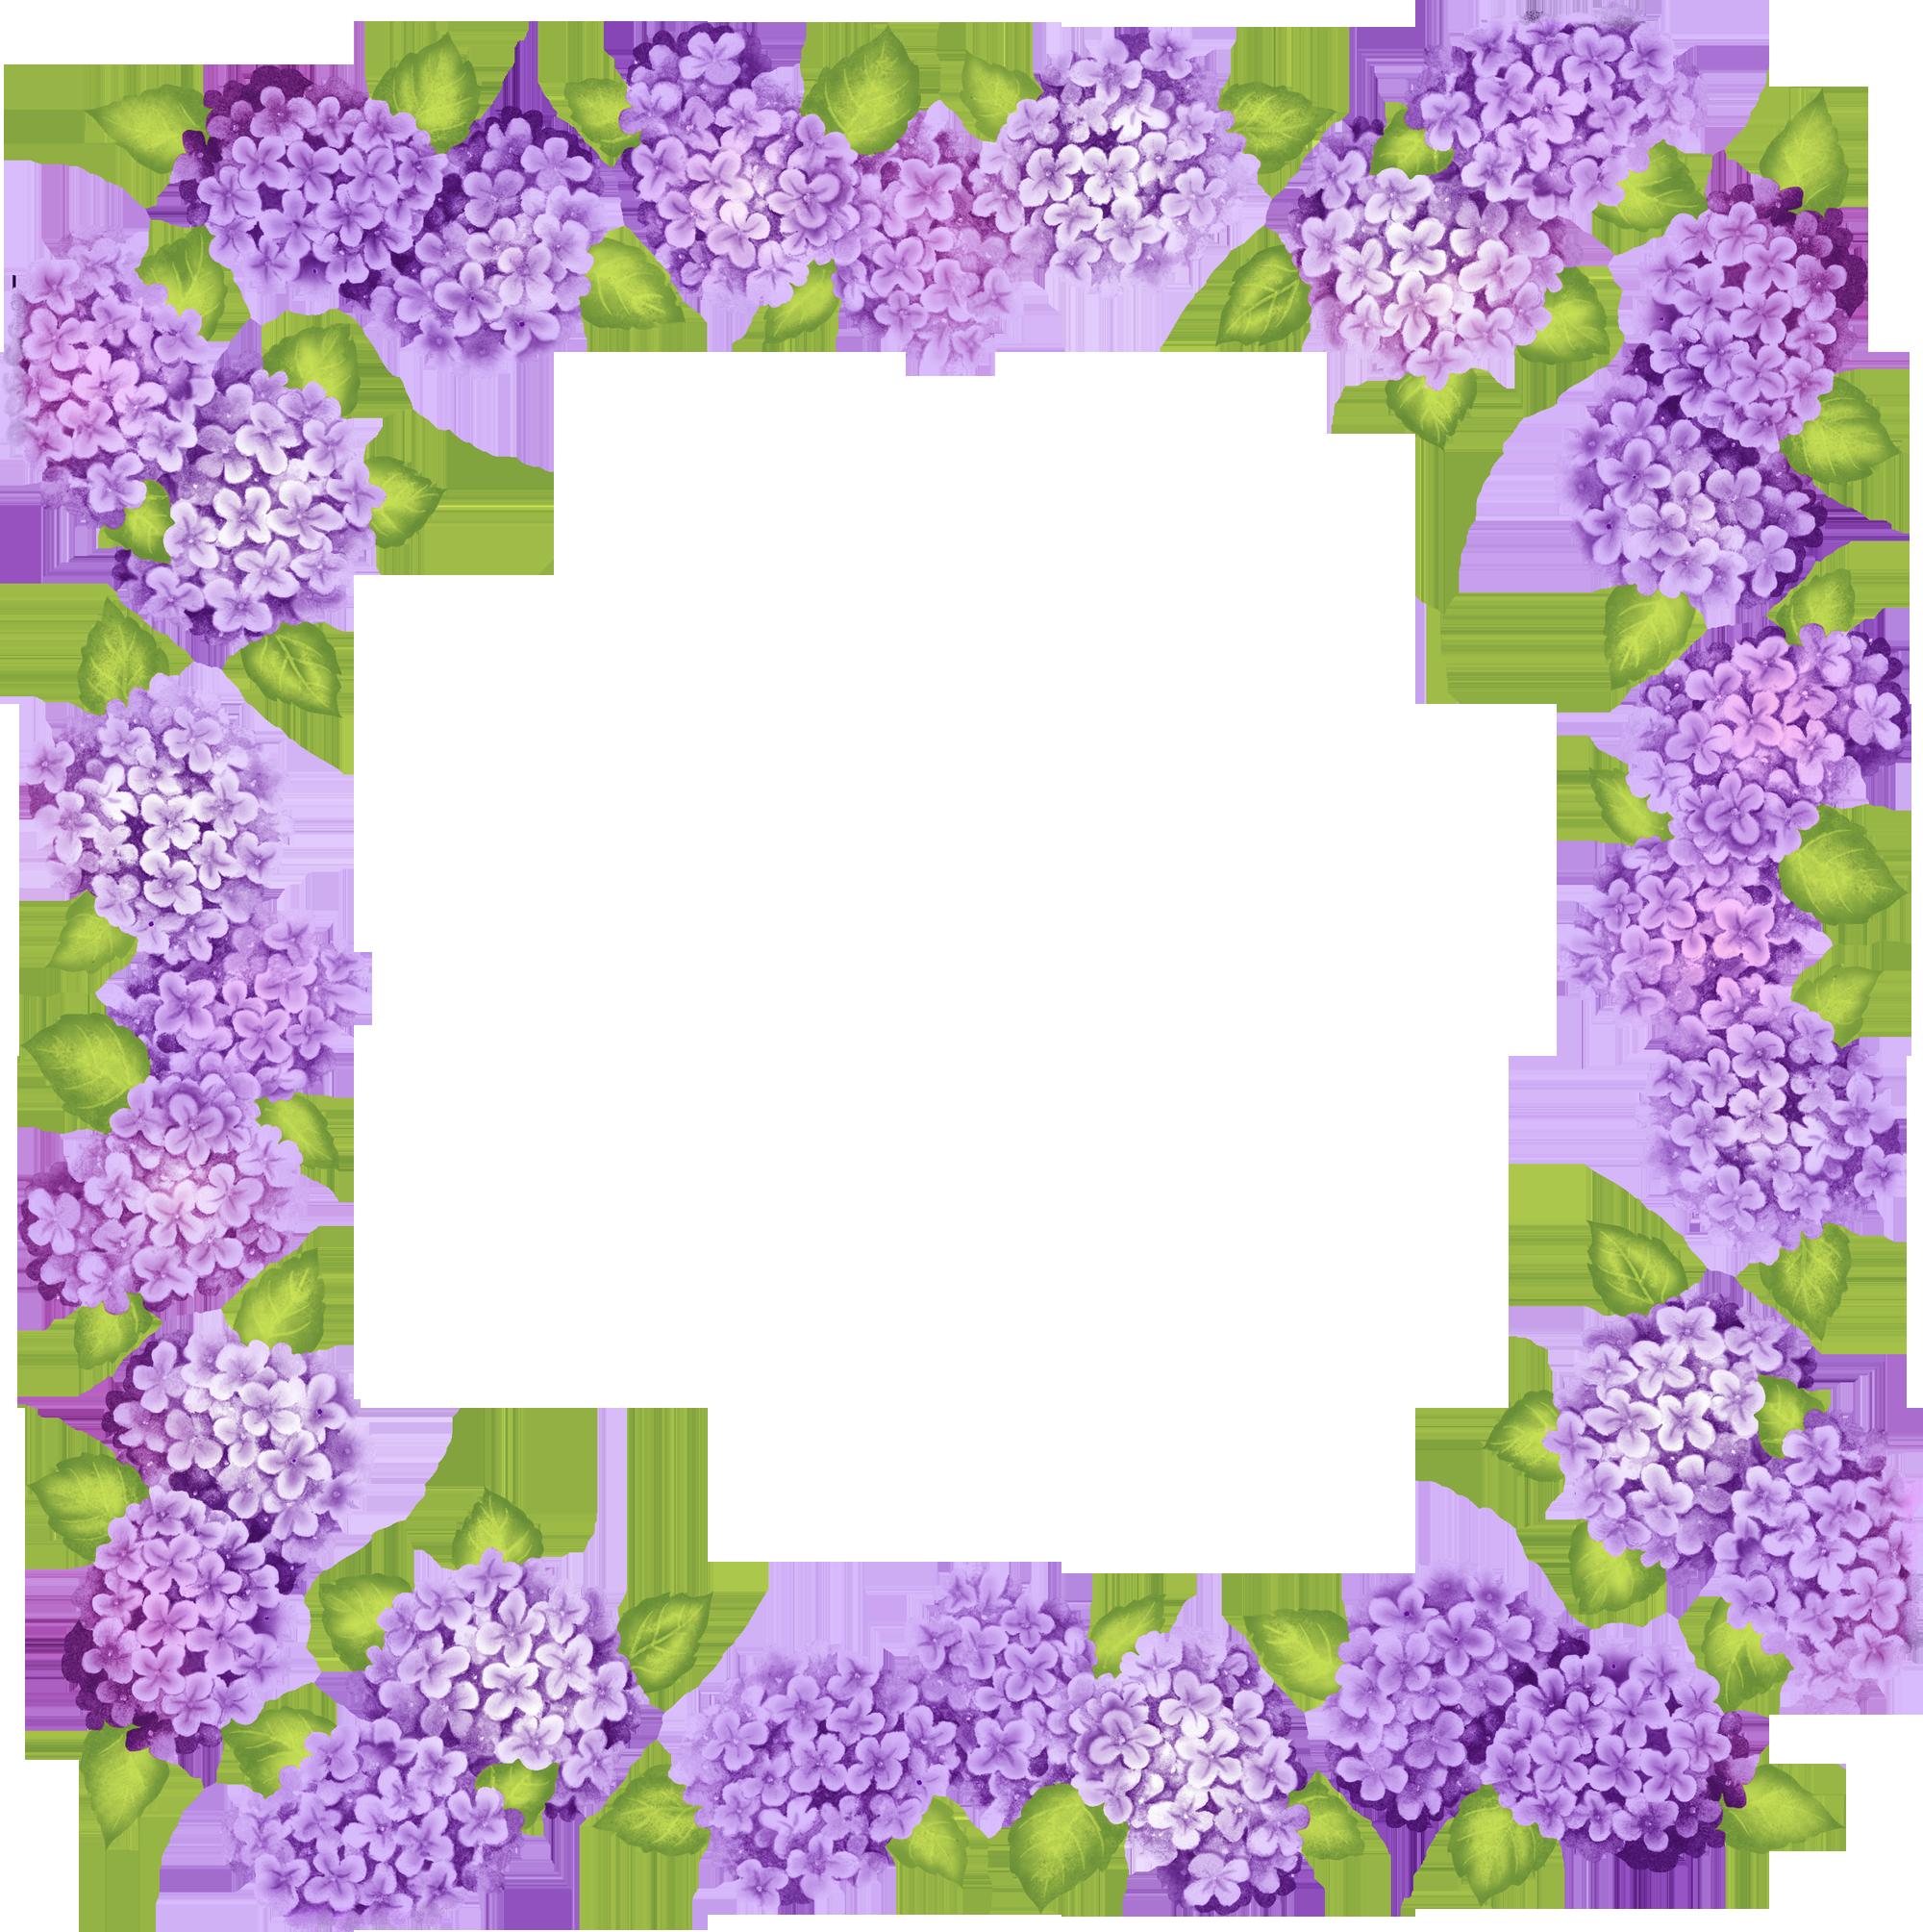 transparent purple frame purple frame polyvore edits frames 1 rh pinterest com French Border Clip Art French Border Clip Art